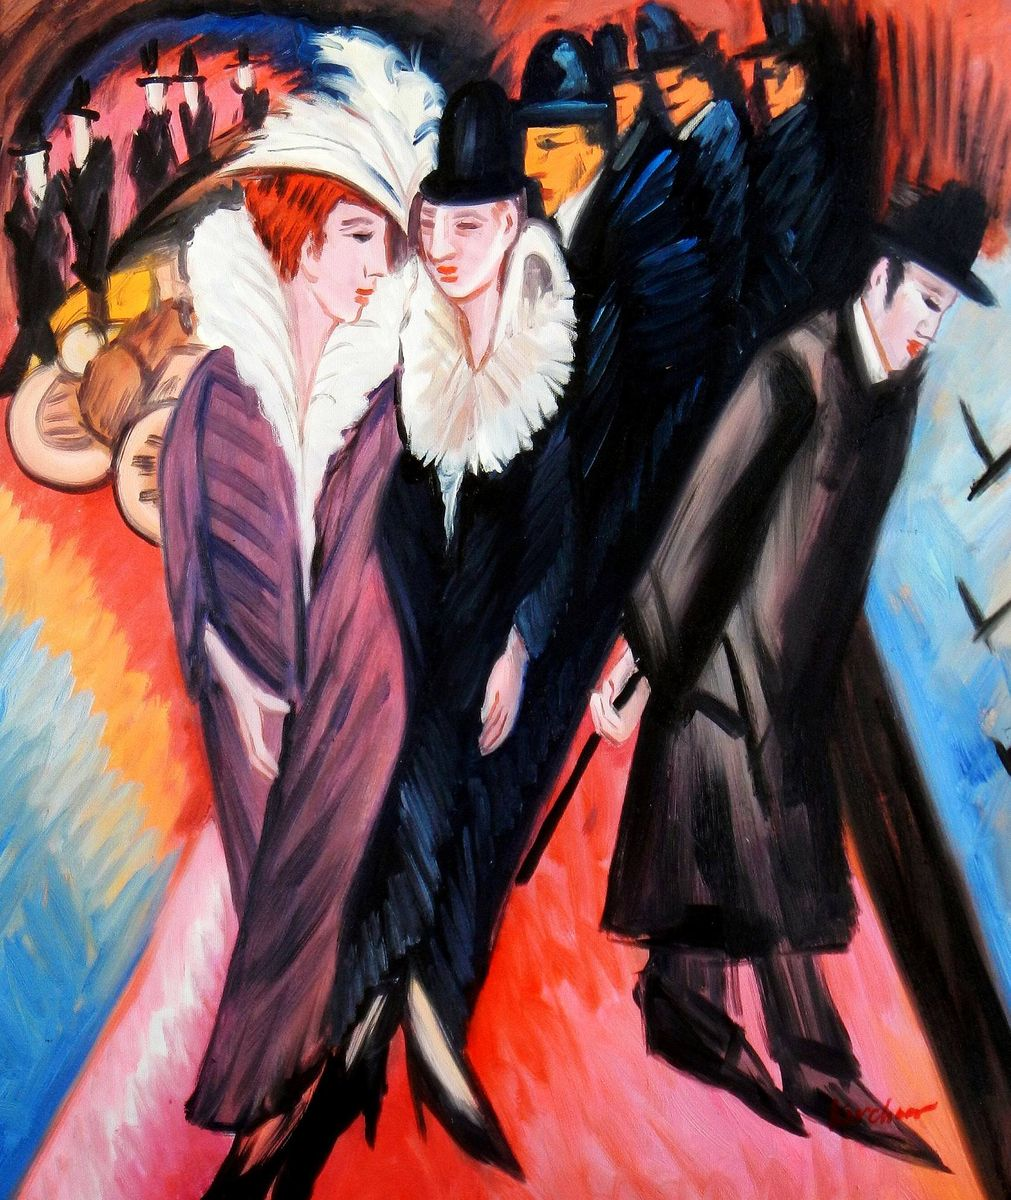 Ernst Ludwig Kirchner - Straßenszene Berlin c93657 50x60cm exquisites Ölbild